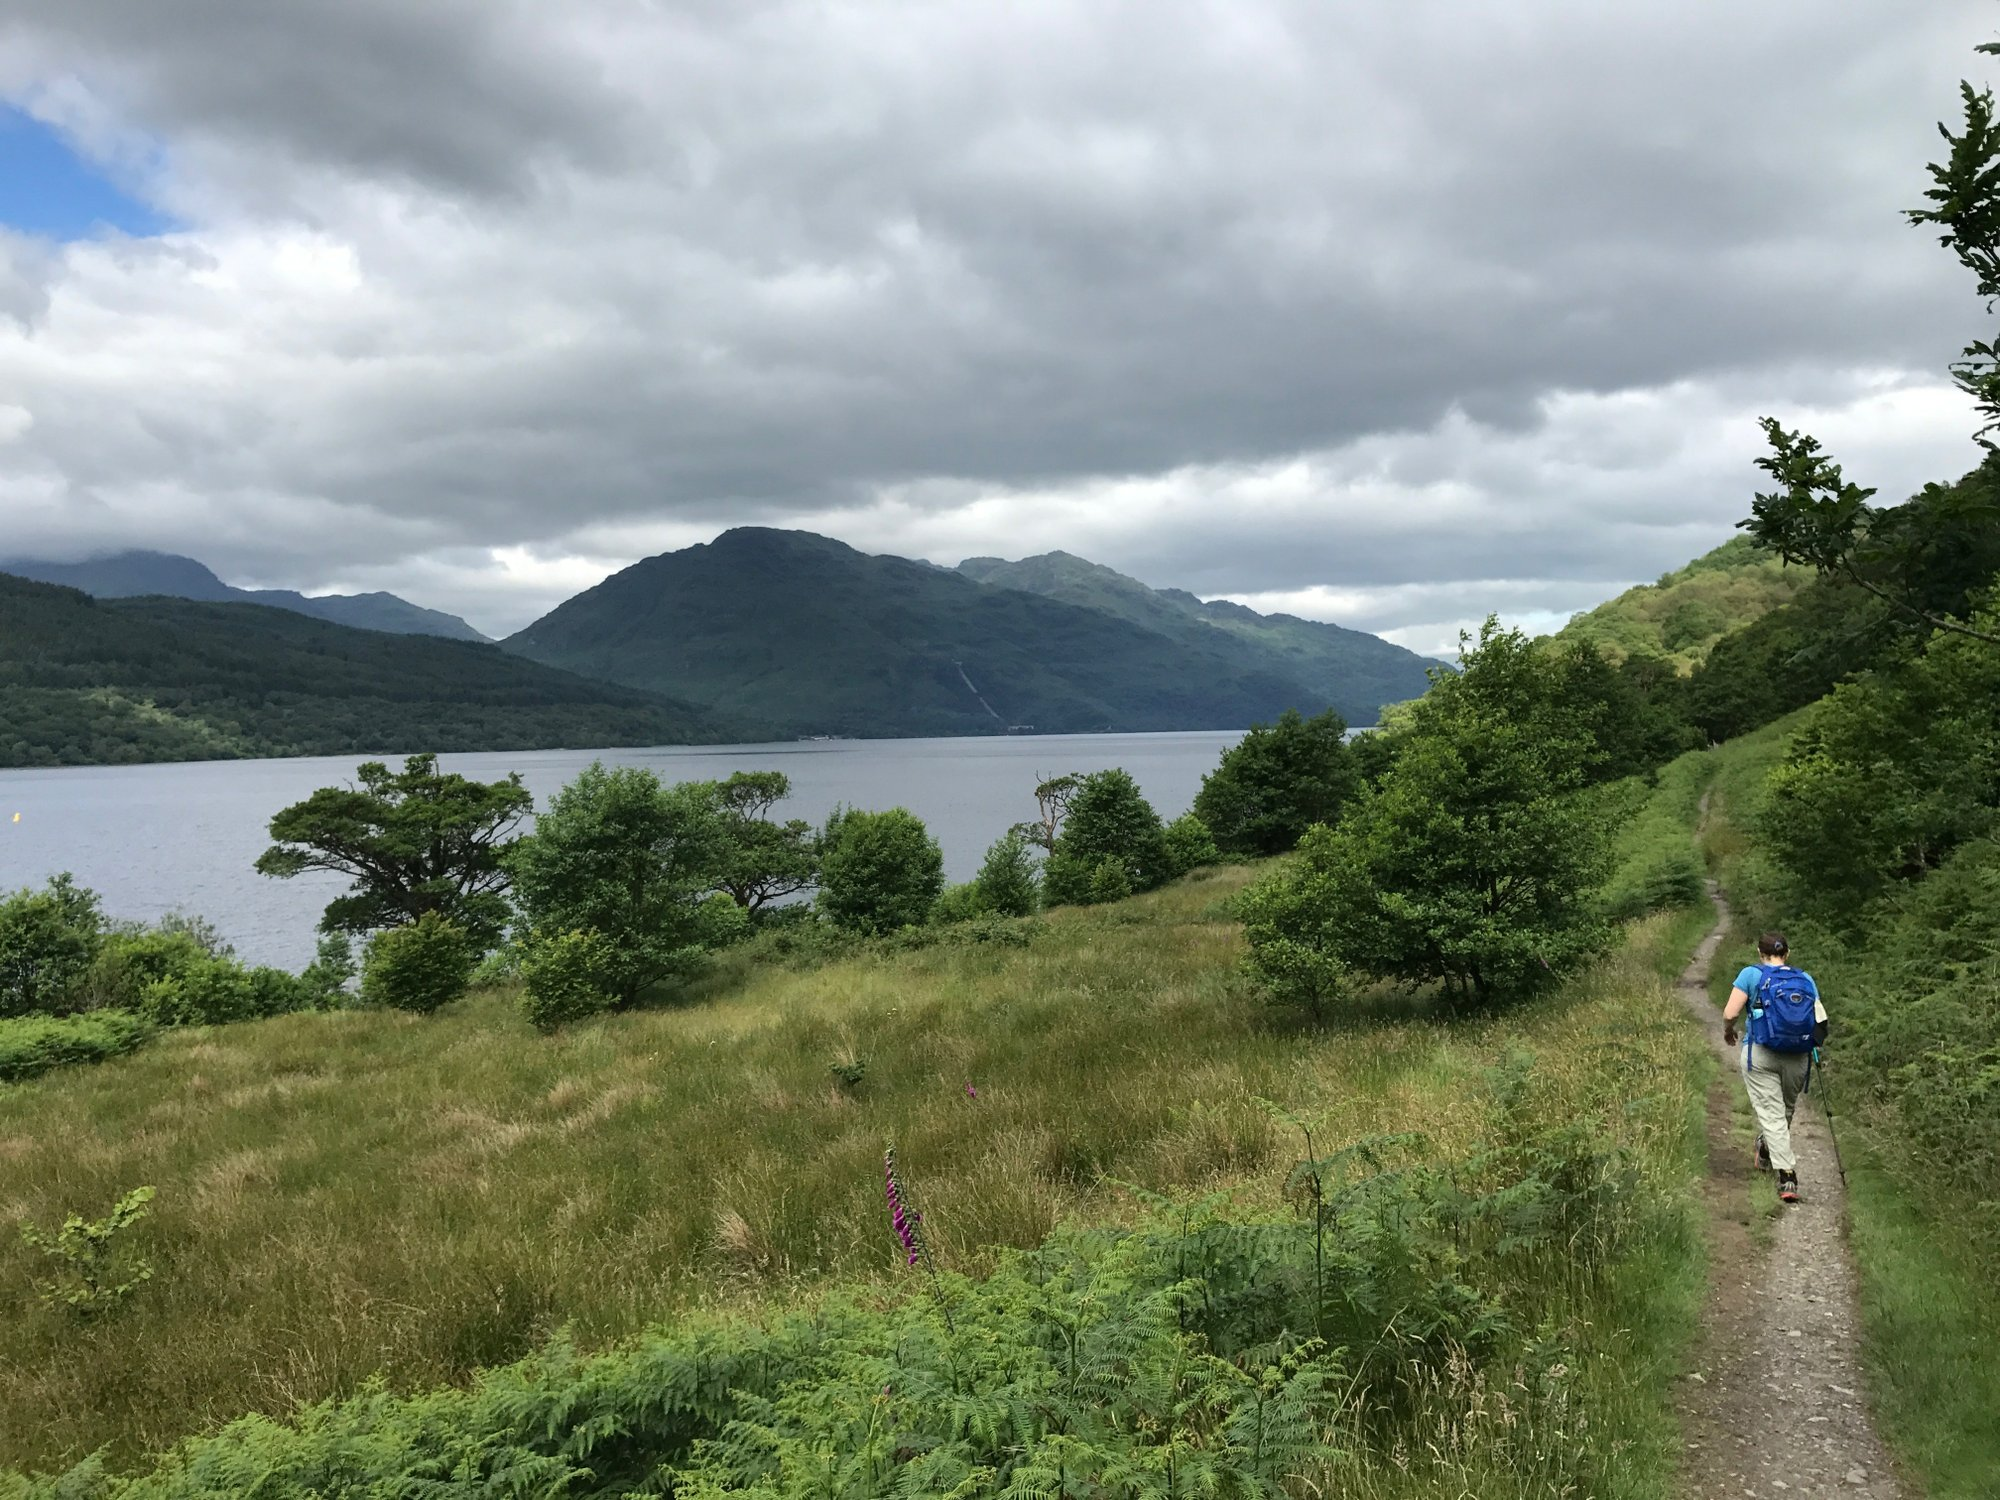 Forests, moors, peat bogs: A week of walking in Scotland